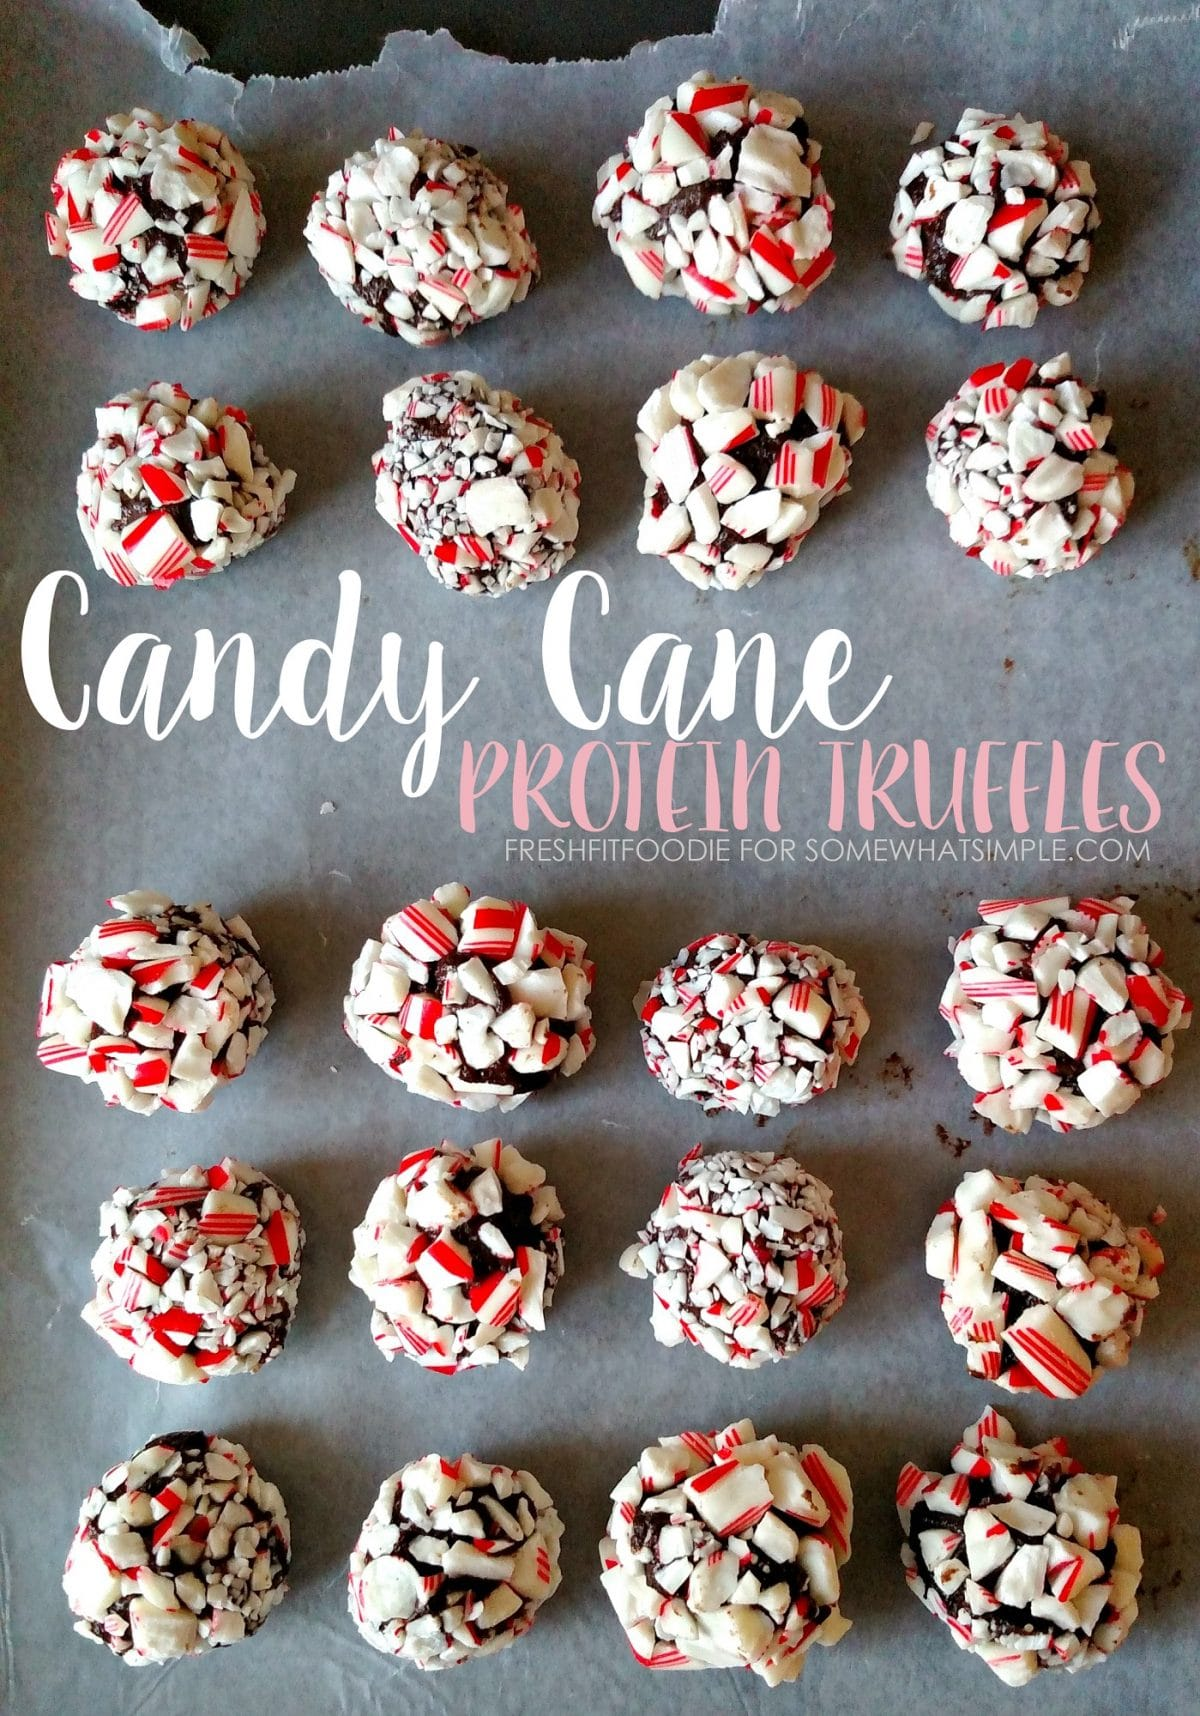 candy cane truffles